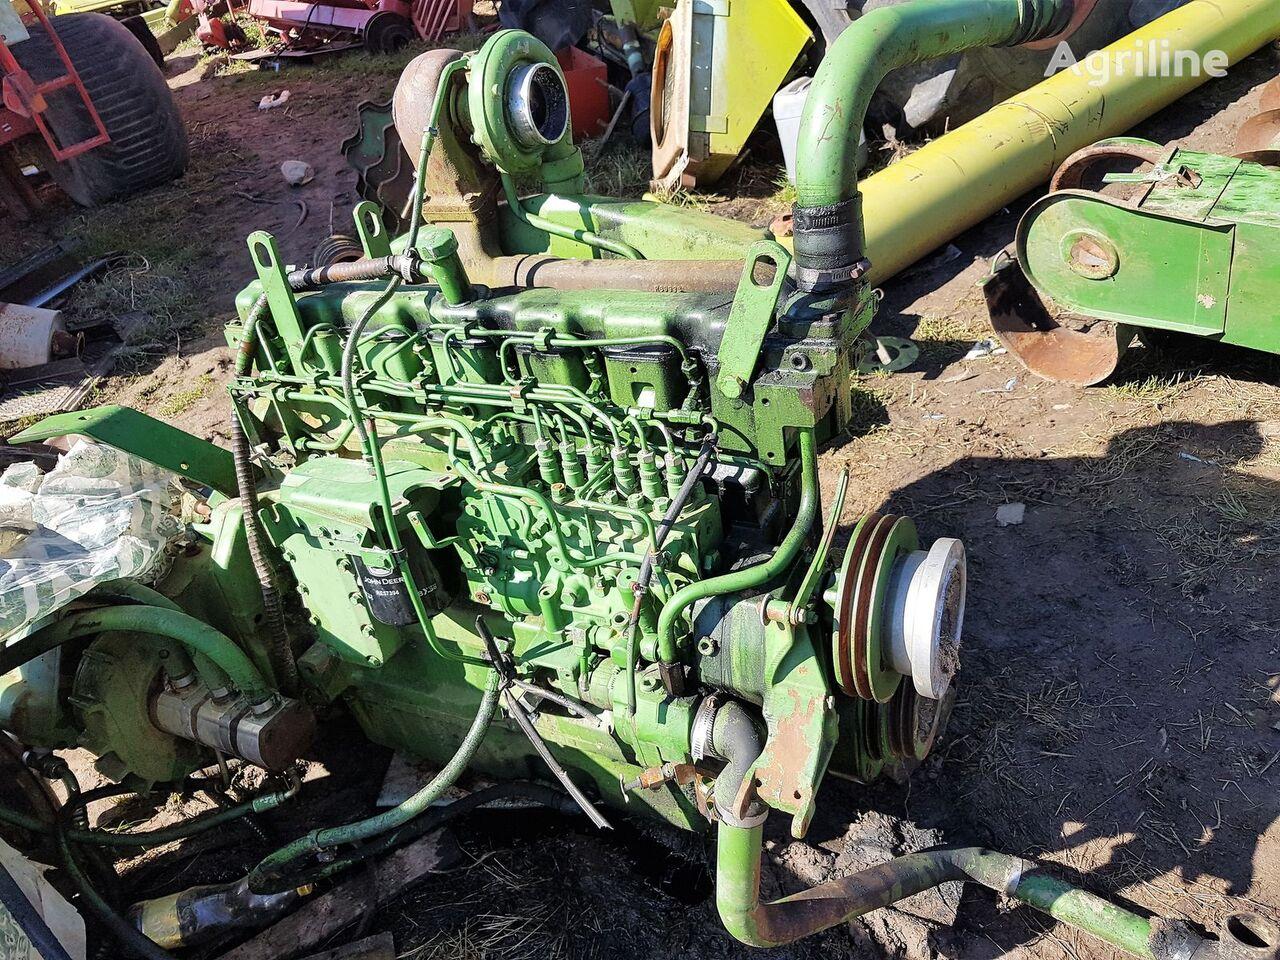 двигатель JOHN DEERE 6076 для зерноуборочного комбайна JOHN DEERE 2064